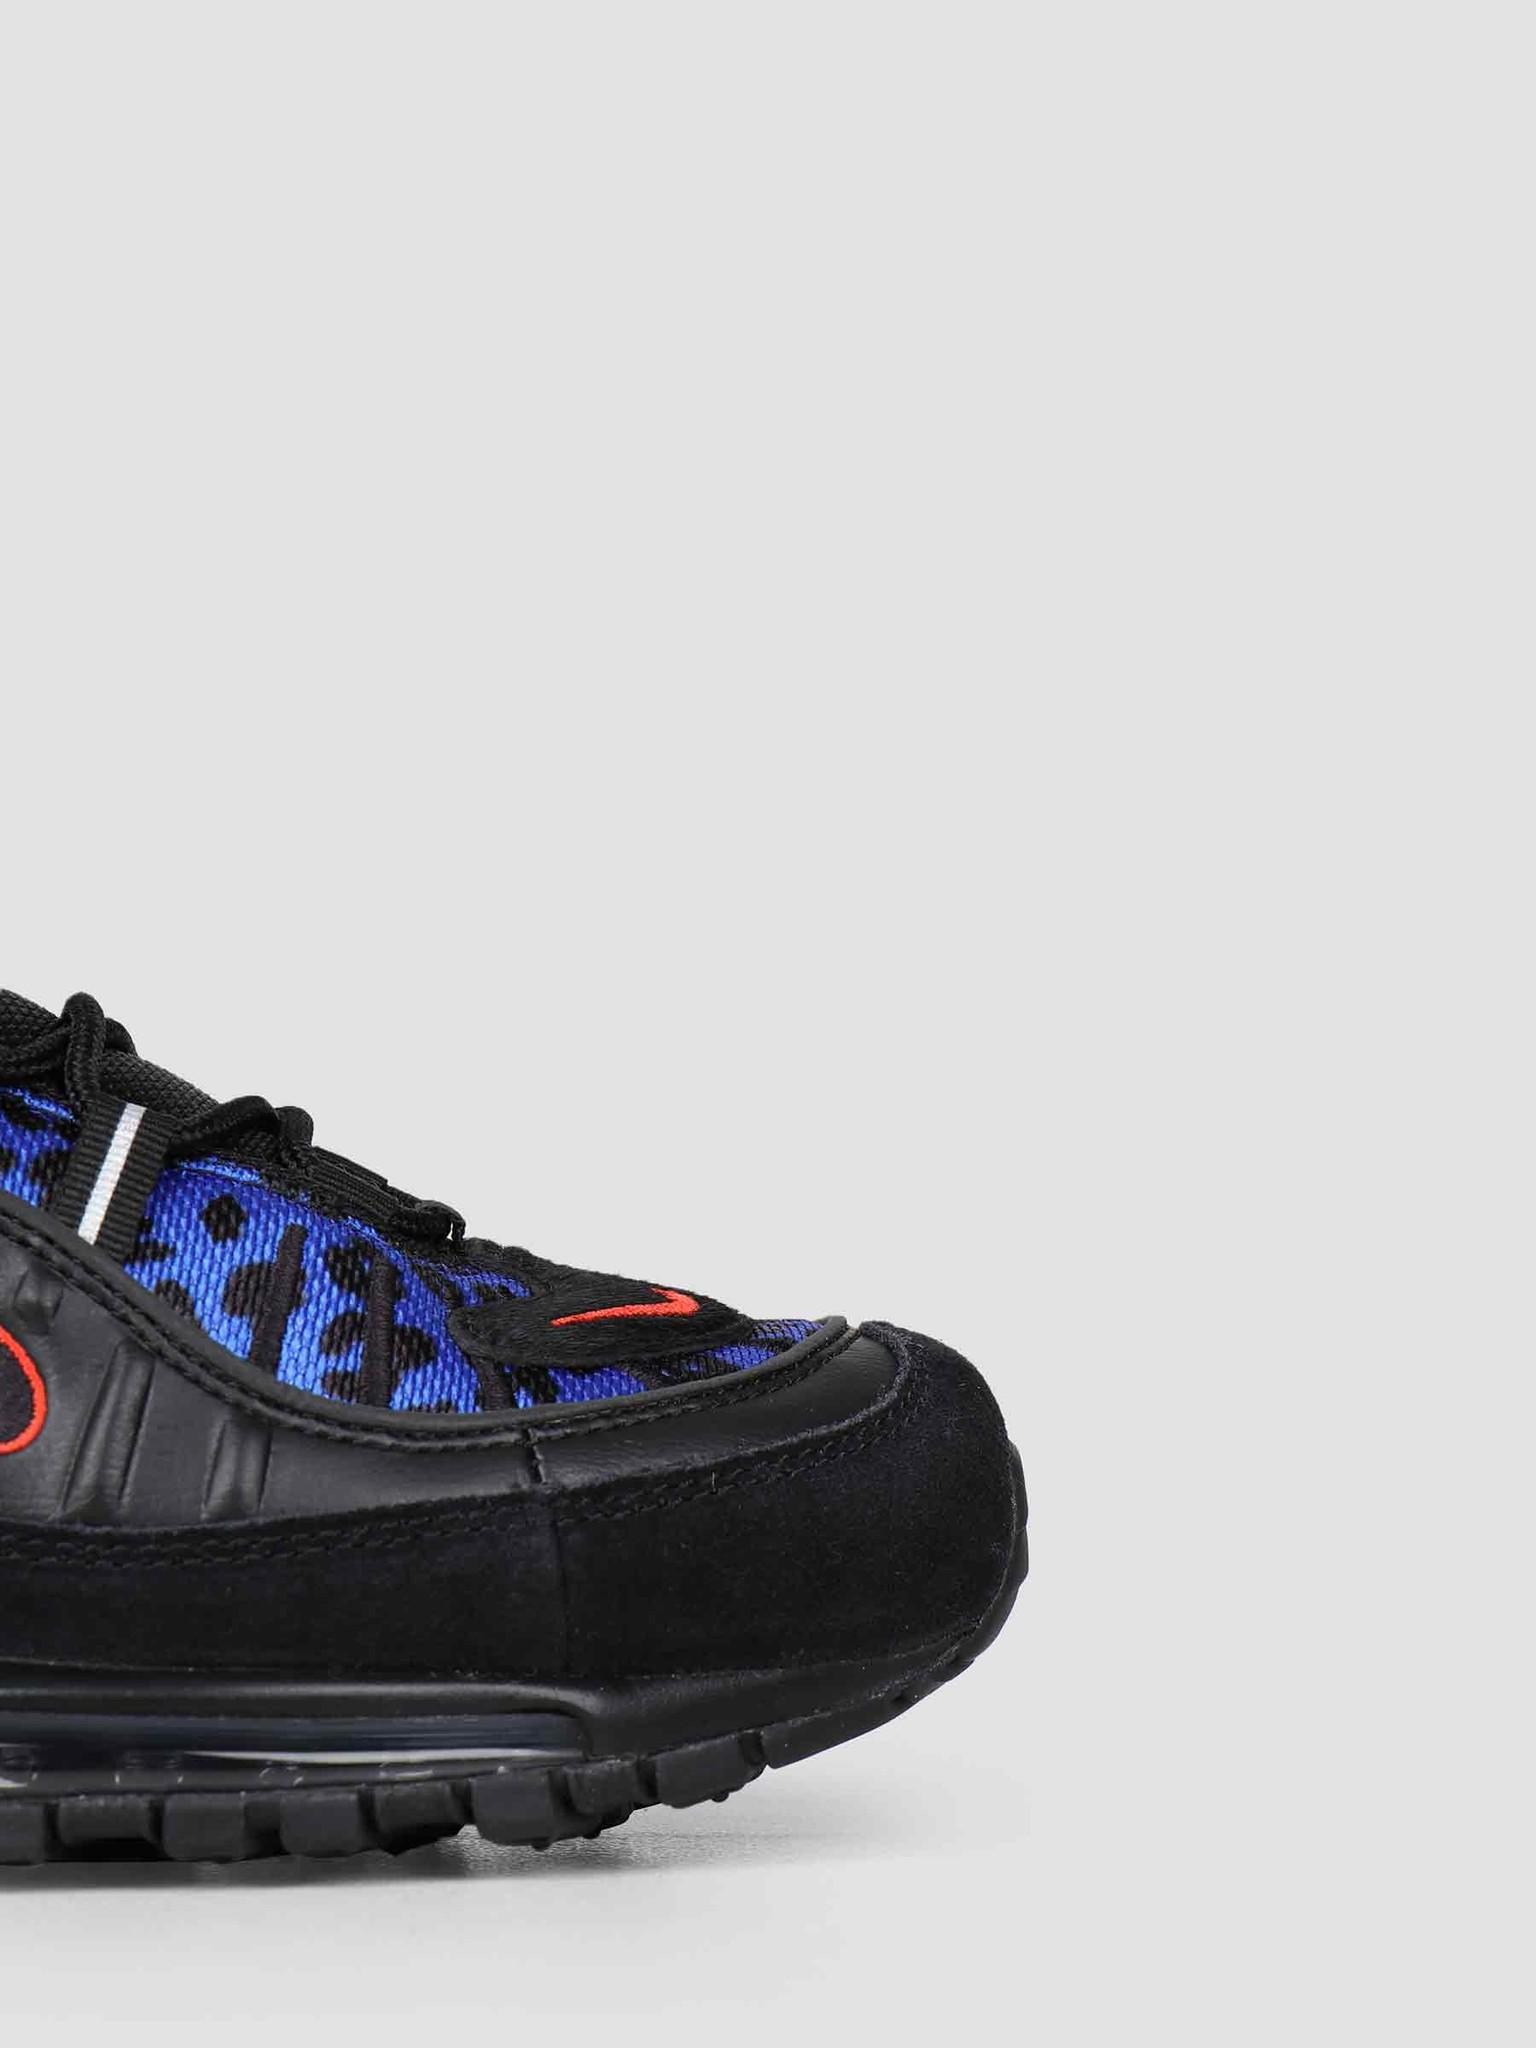 Nike Nike Air Max 98 Premium Black Habanero Red Racer Blue BV1978-001